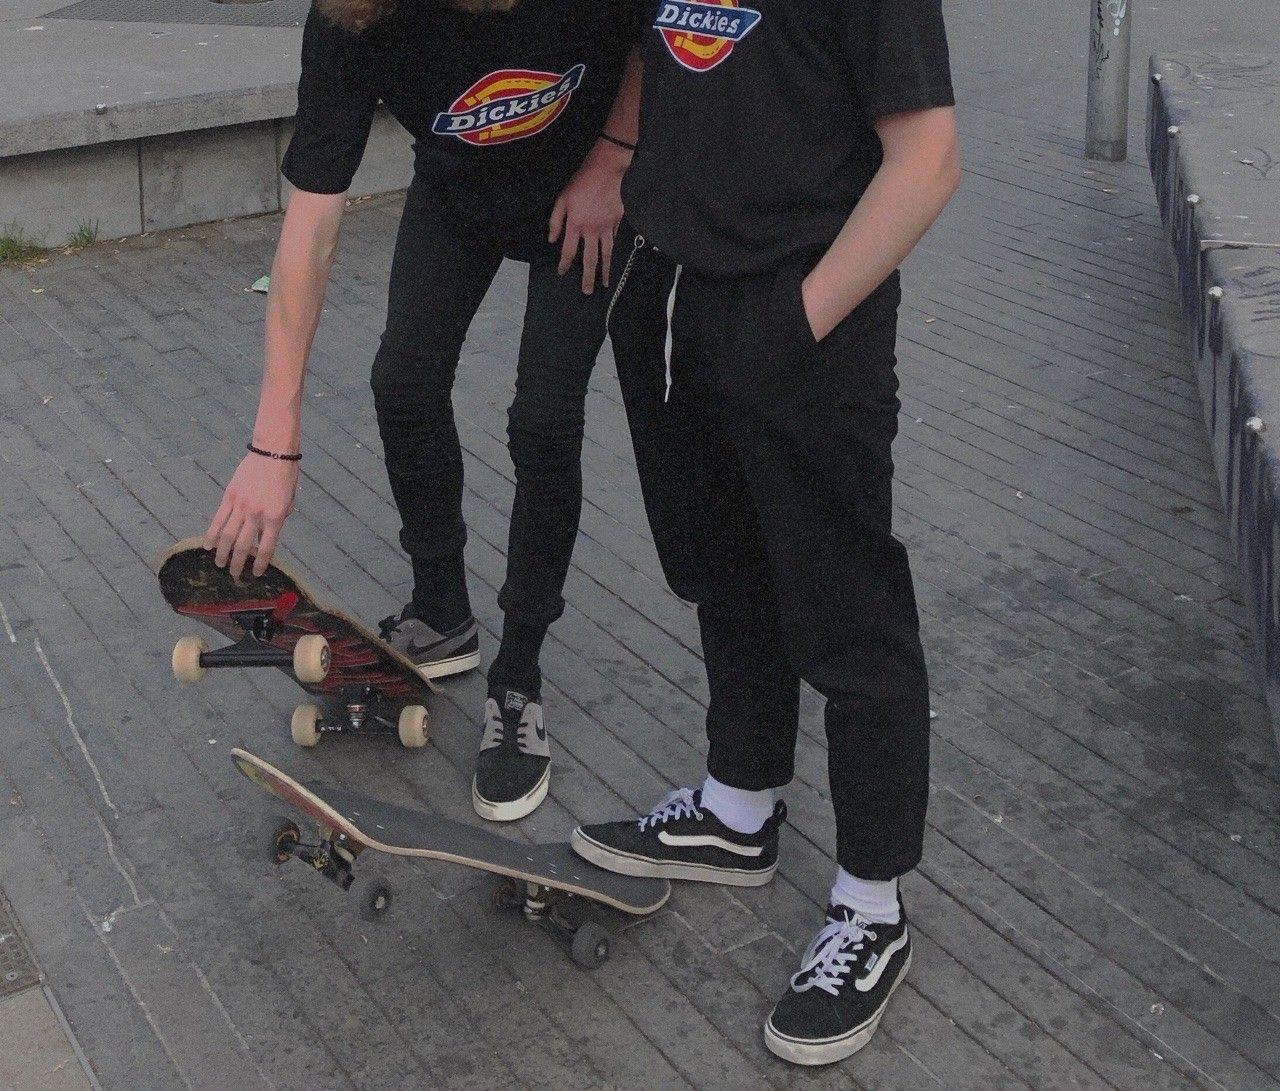 𝚏𝚘𝚕𝚕𝚘𝚠 𝚏𝚘𝚛 𝚖𝚘𝚛𝚎 𝒚𝒐𝒖𝒏𝒈𝒃𝒓𝒂𝒕𝒛𝒙 Skateboard photos, Skate